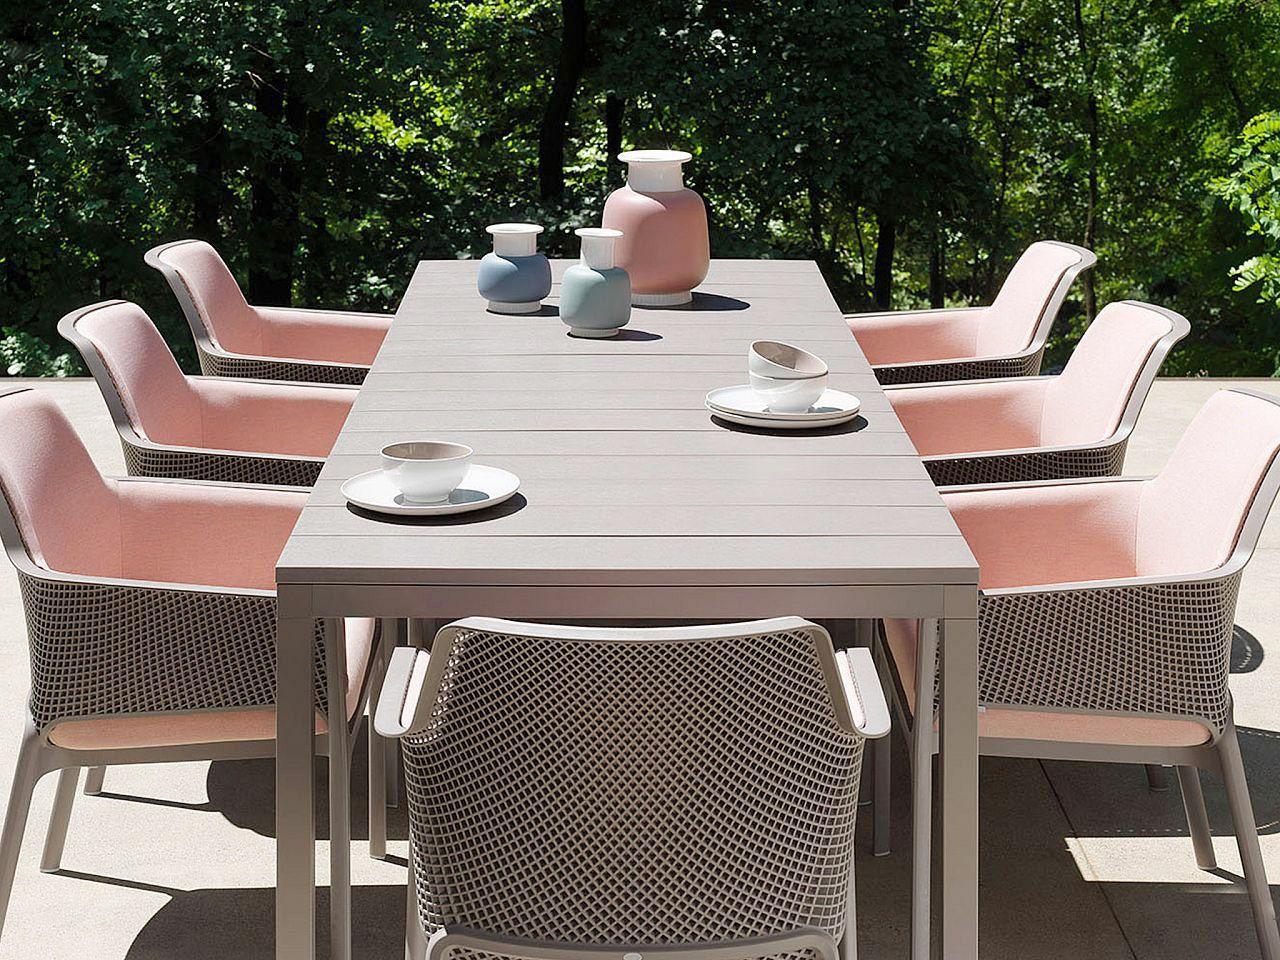 Nardi Mobili ~ Nardi rio 210 table set with net relax chairs and rose quartz